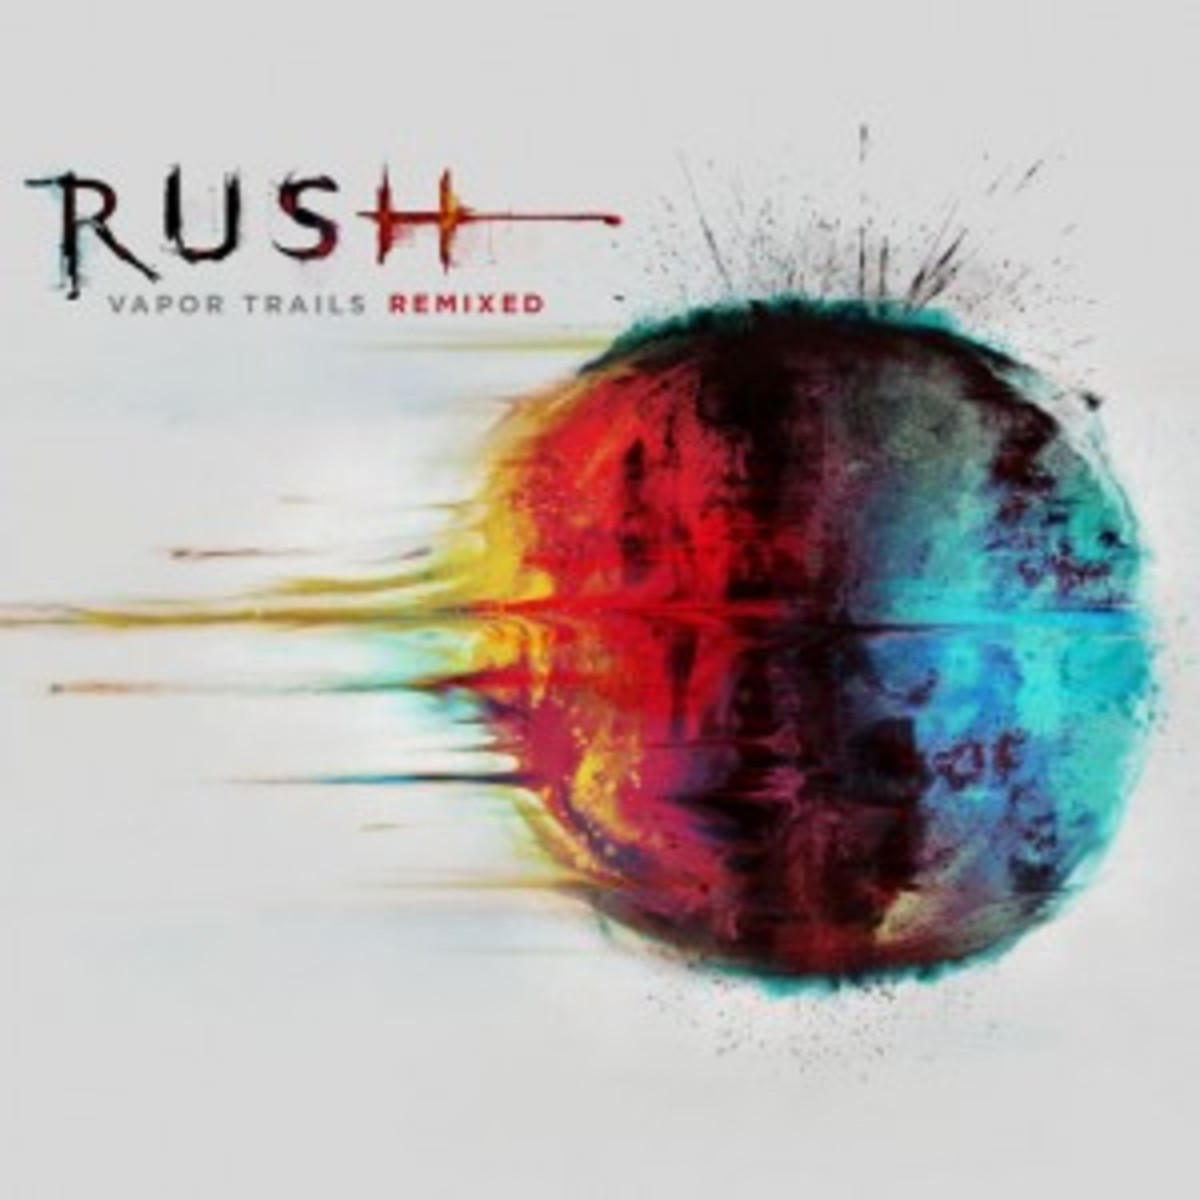 Rush Vapor Trails remixed